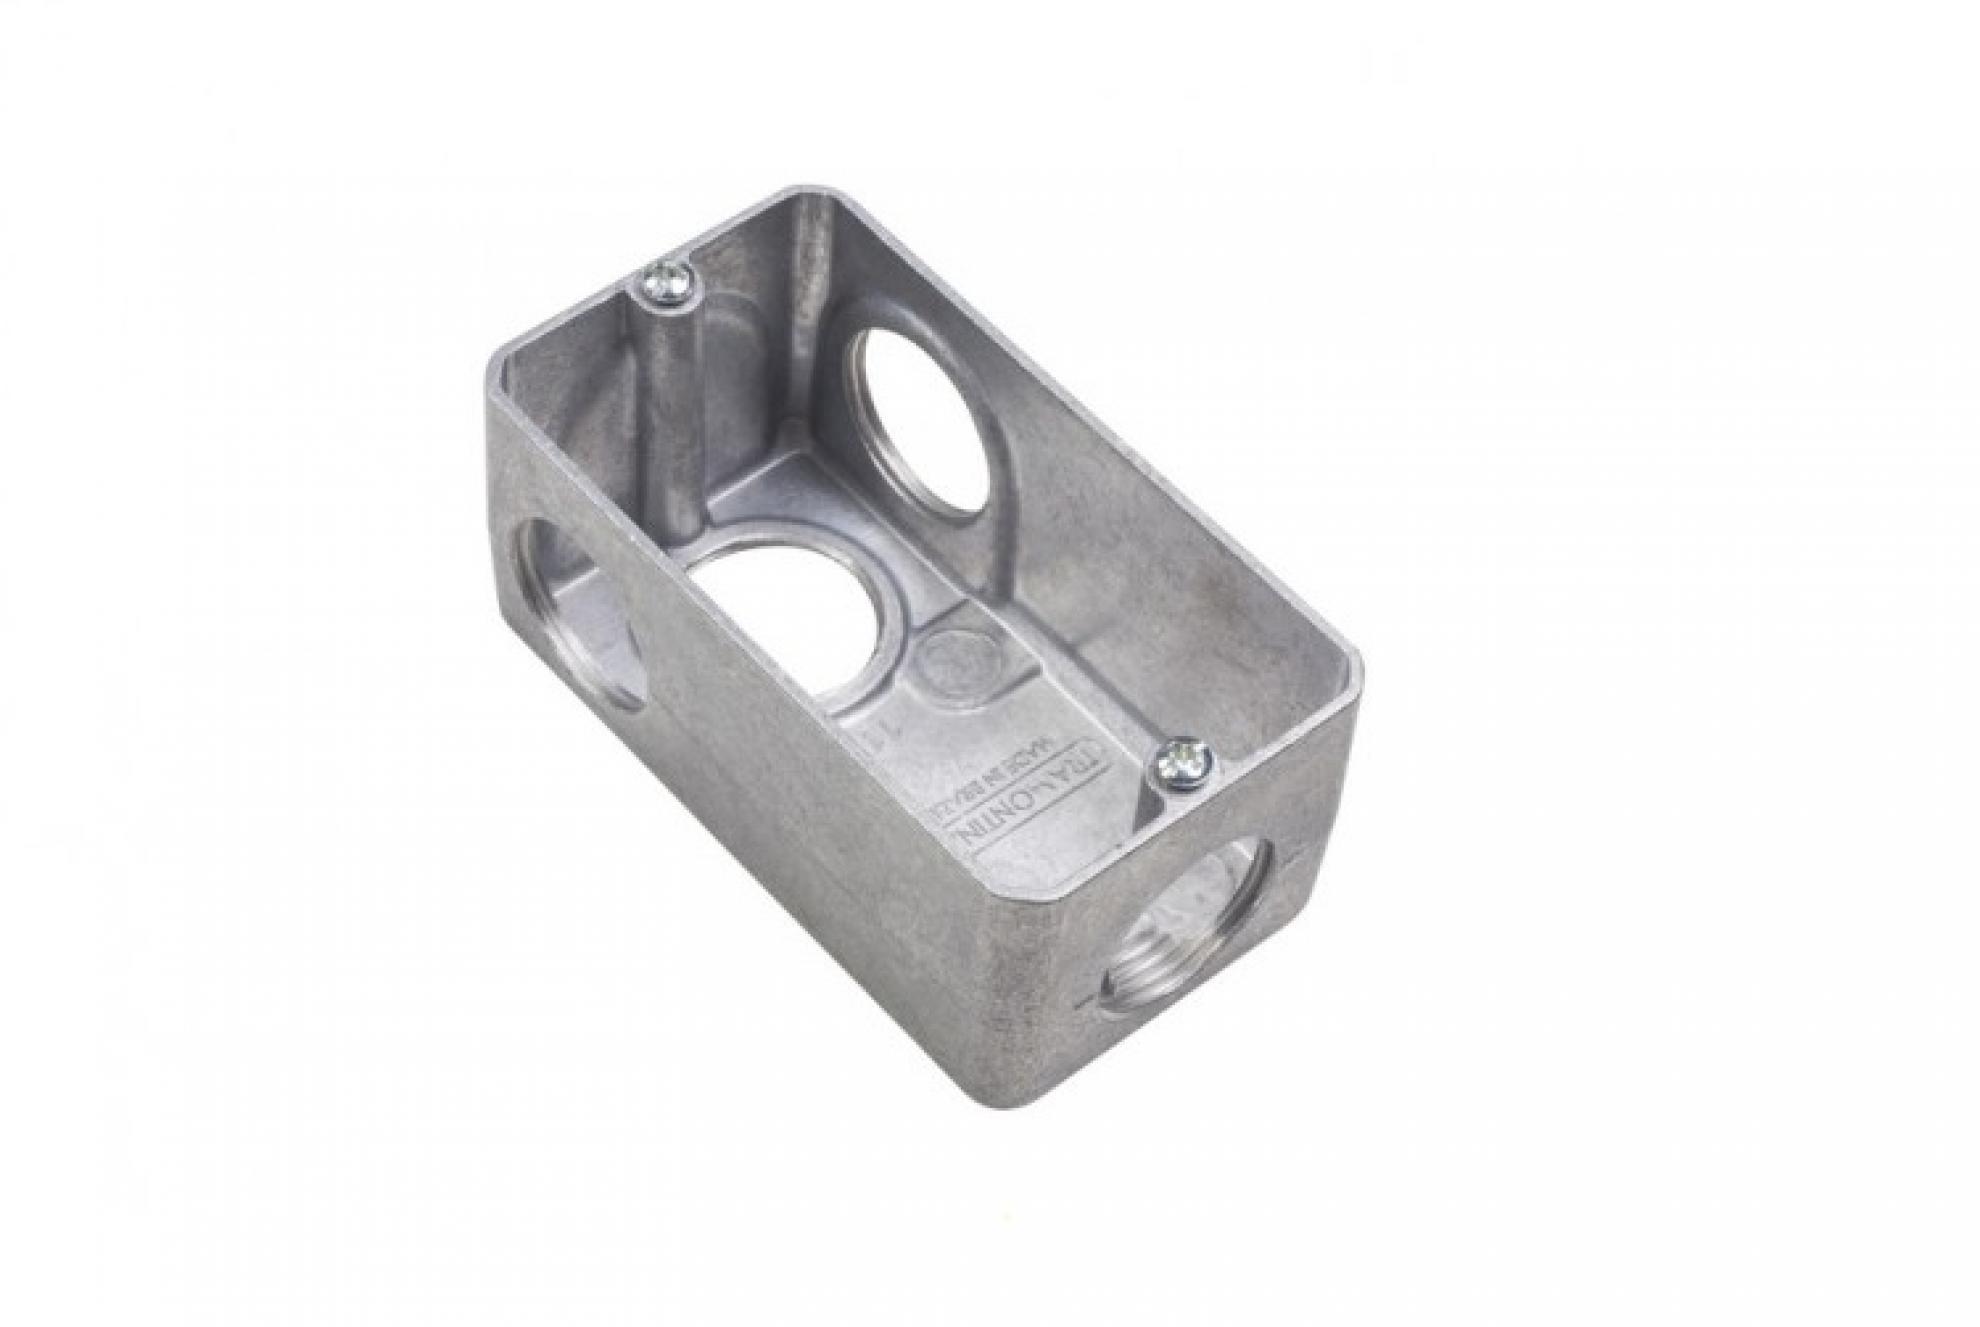 Condulete Aluminio Multiplo L 1.1/2 com tampa